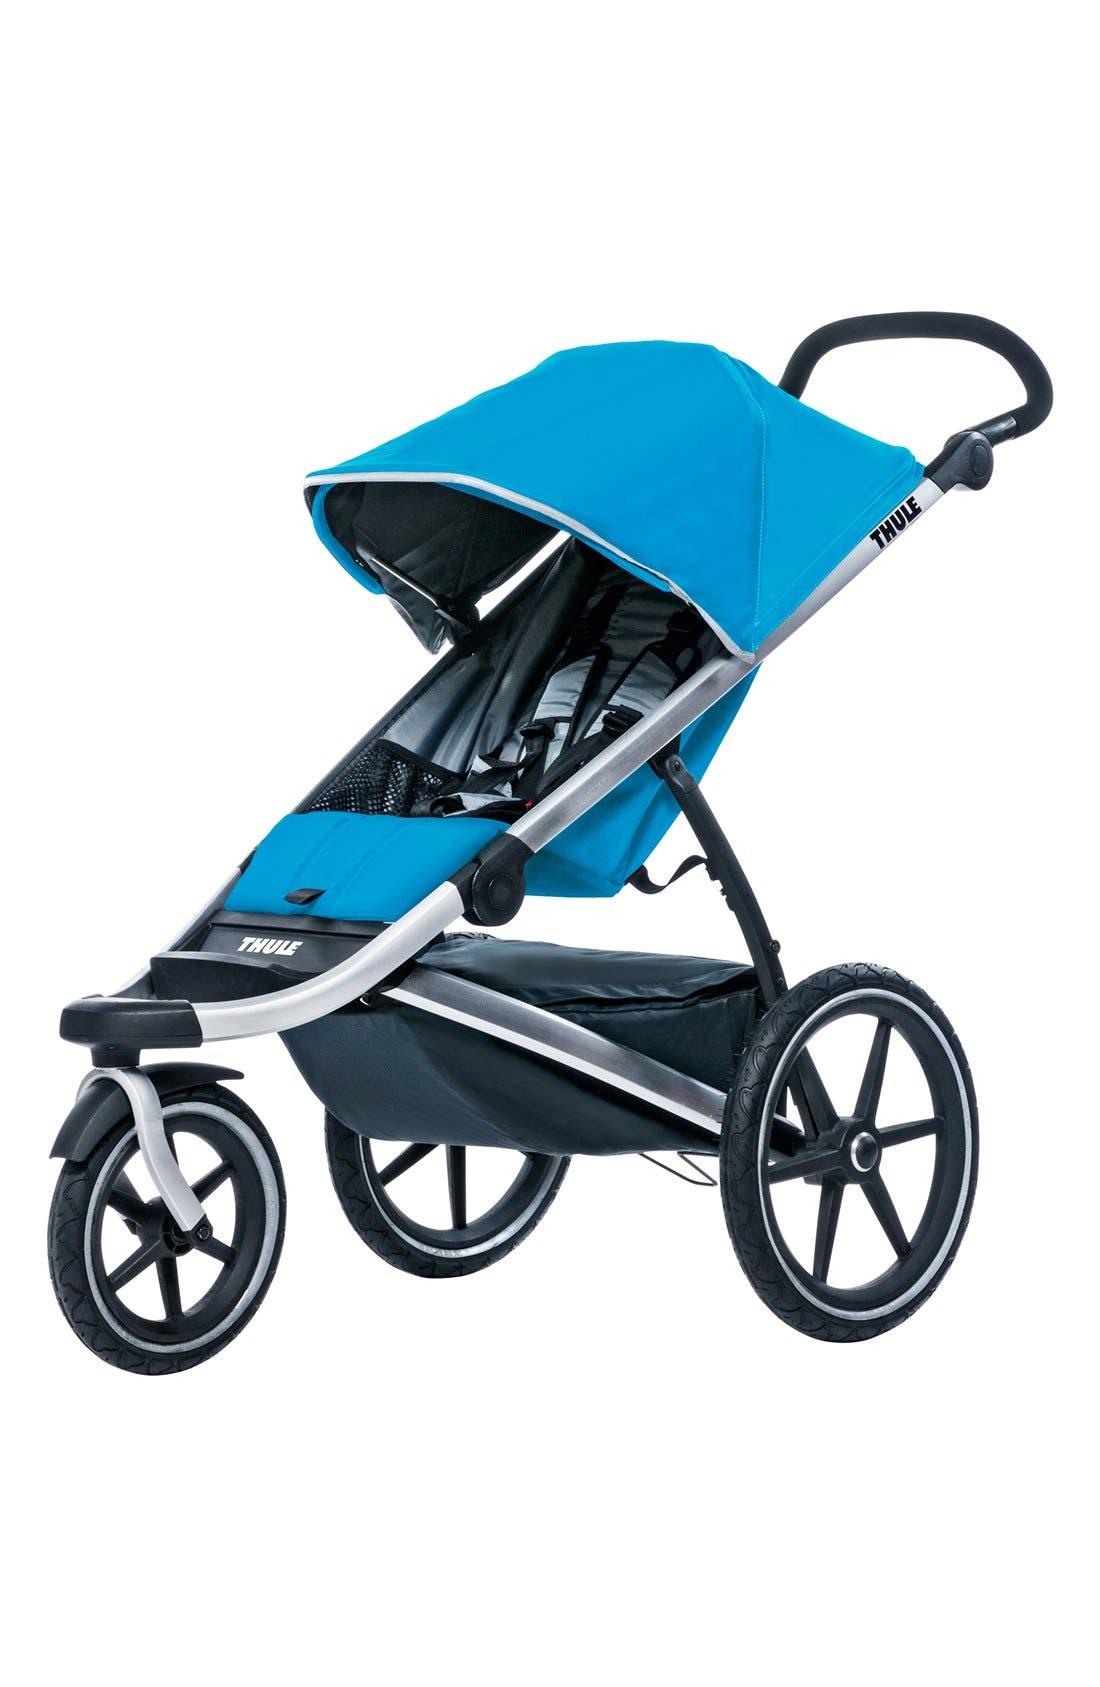 Thule 'Urban Glide 1' Jogging Stroller